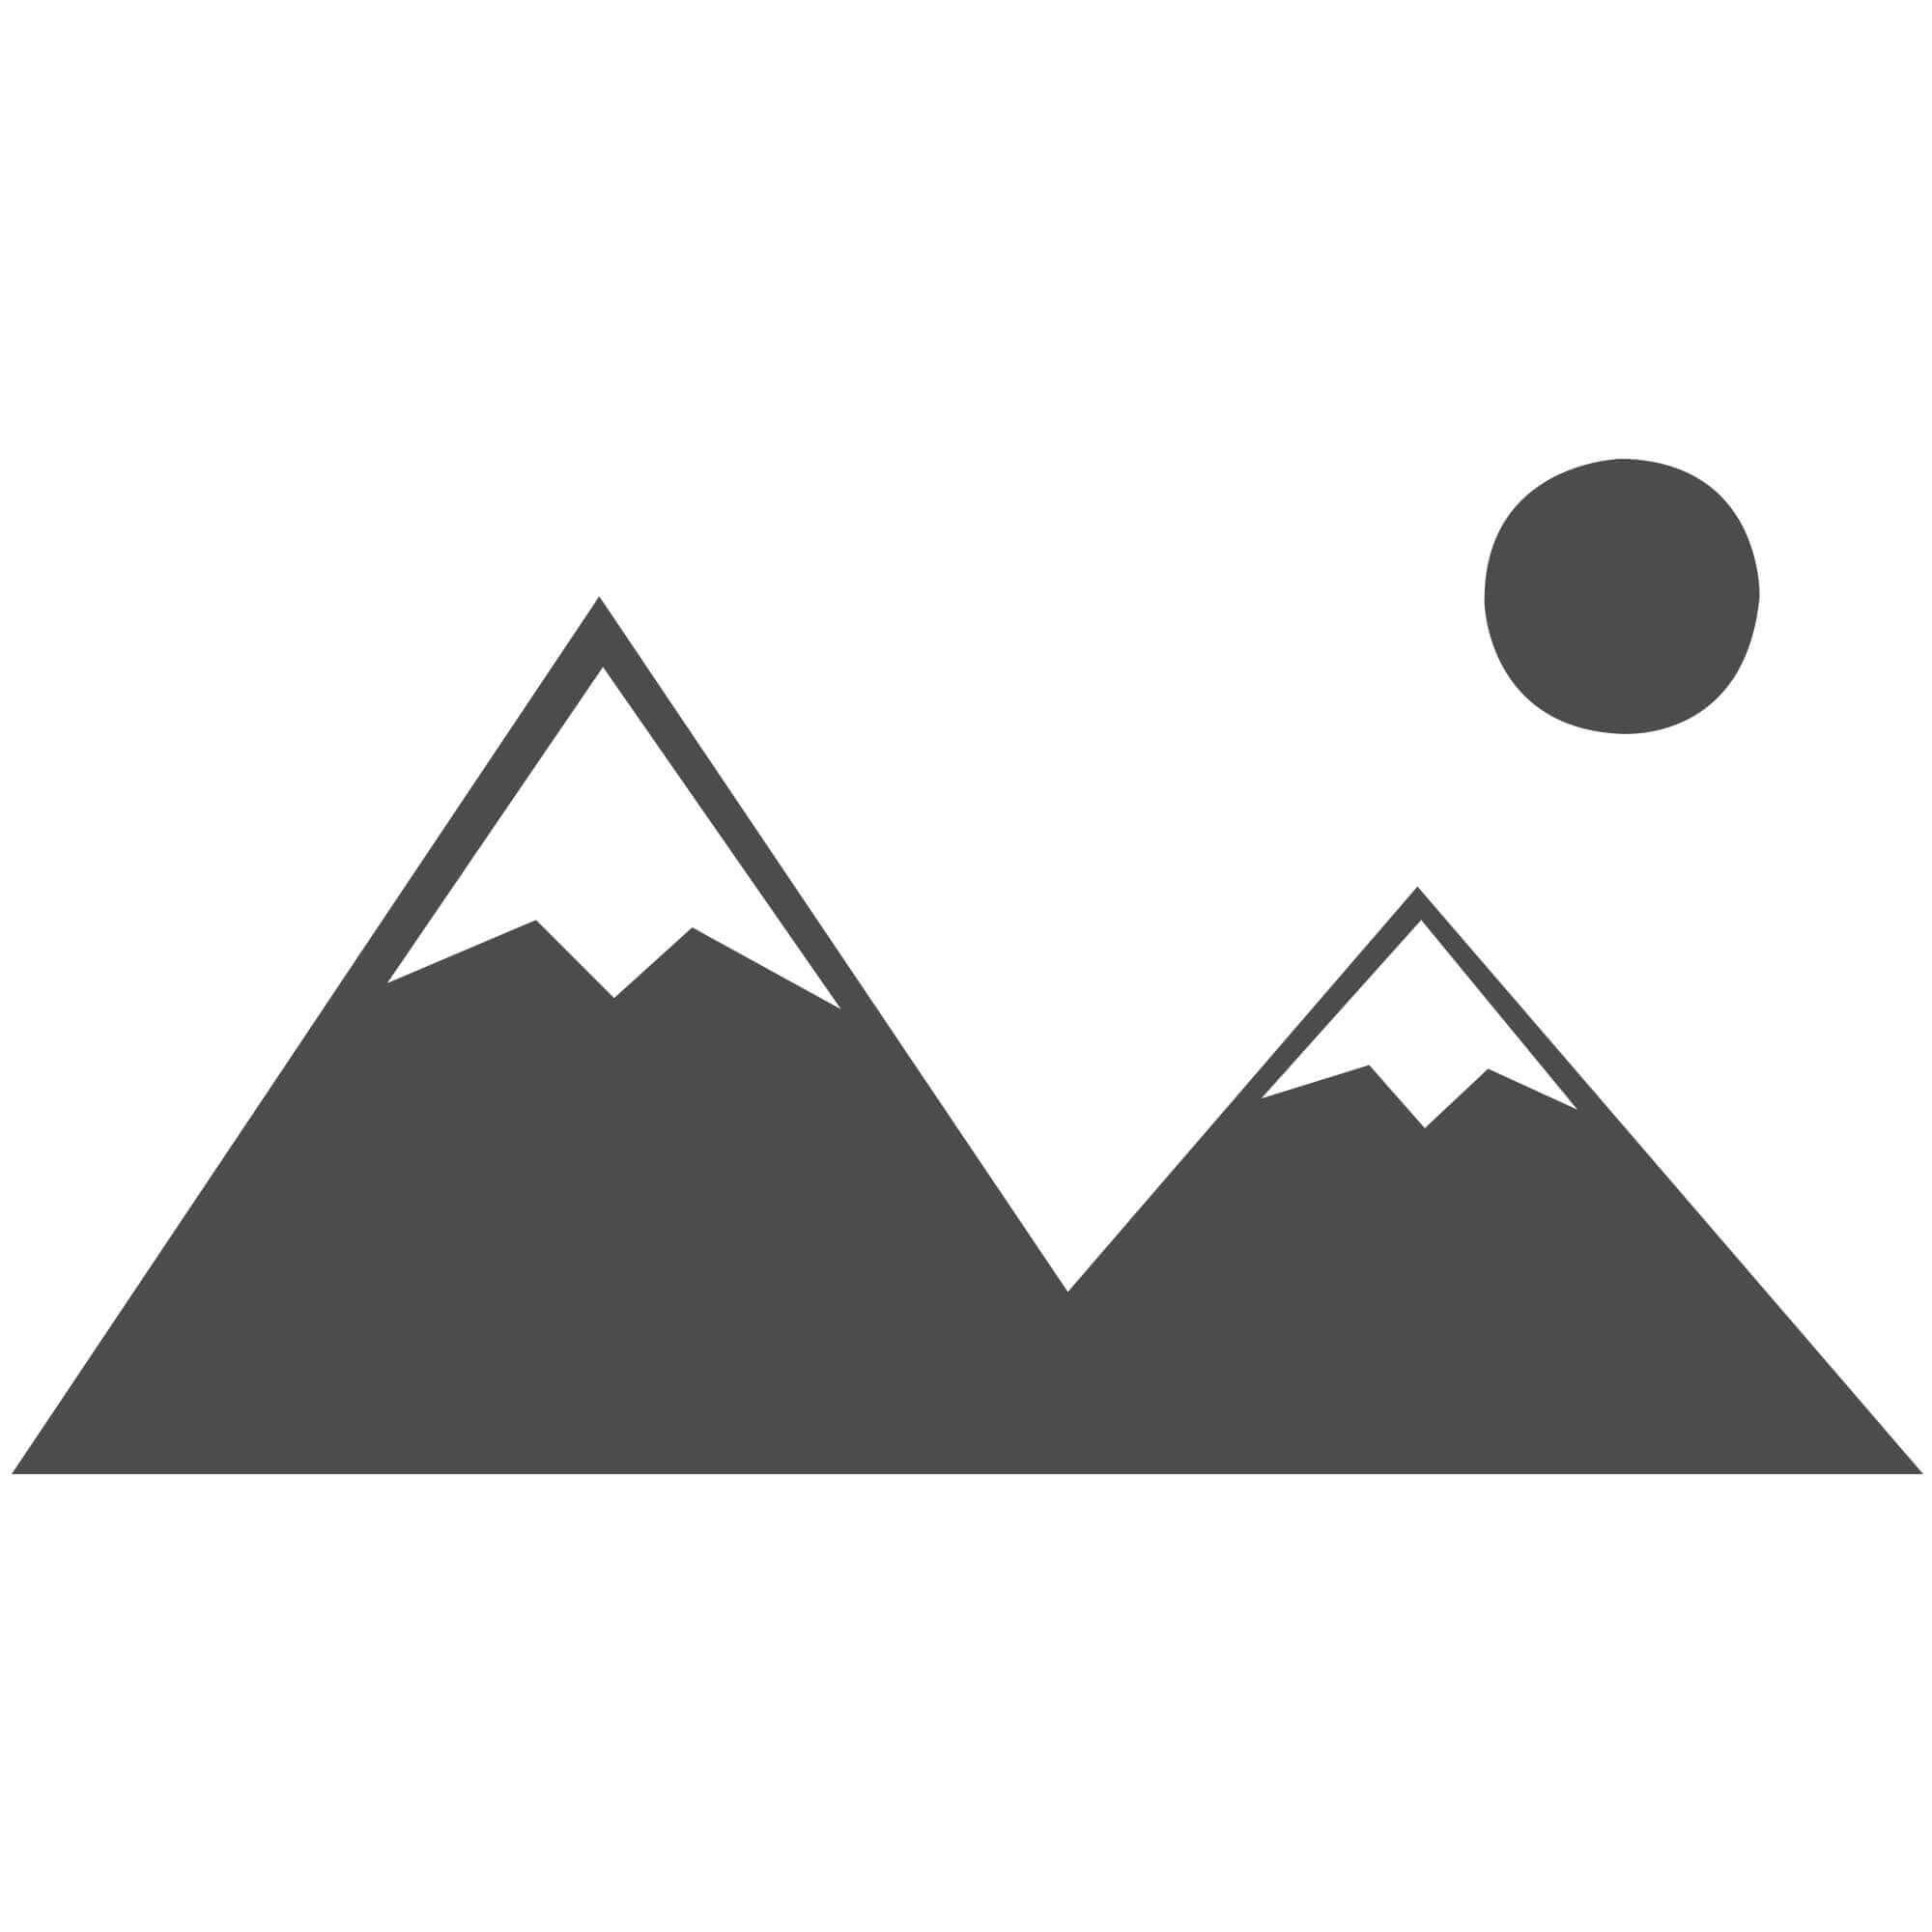 "Arabesque Moroccan Pattern Wool Rug - Blue -200 x 285 cm (6'7"" x 9'4"")"